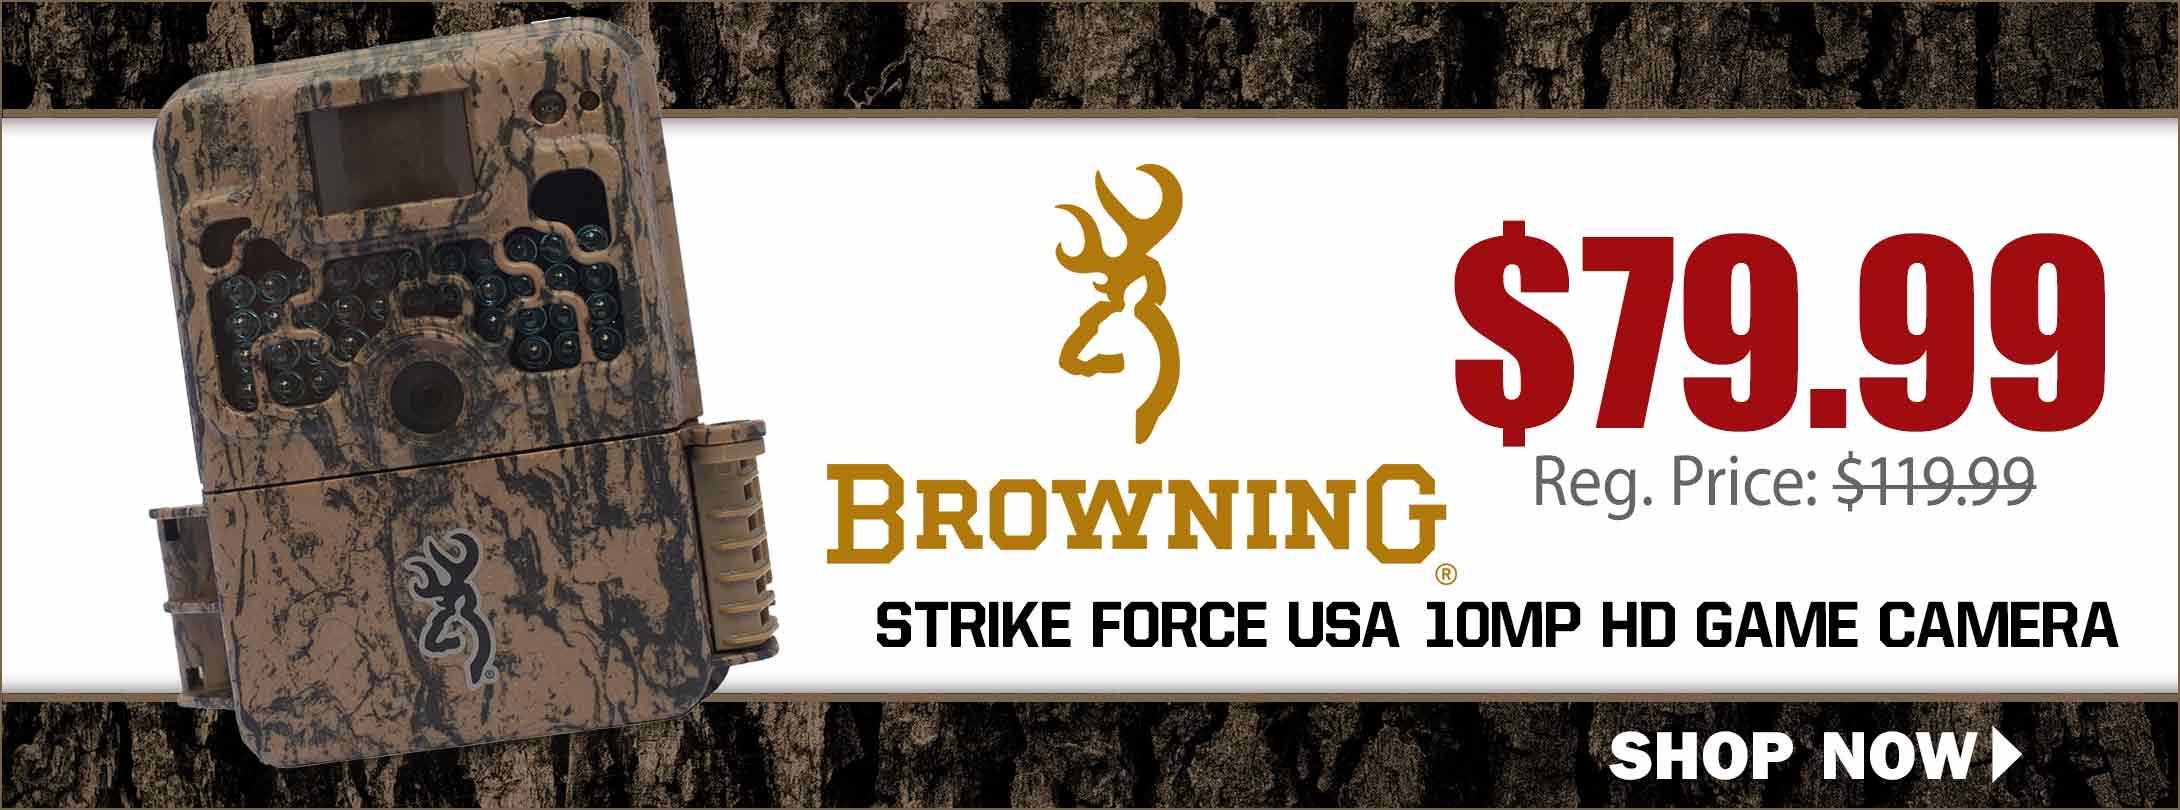 Browning Strike Force Game Cam